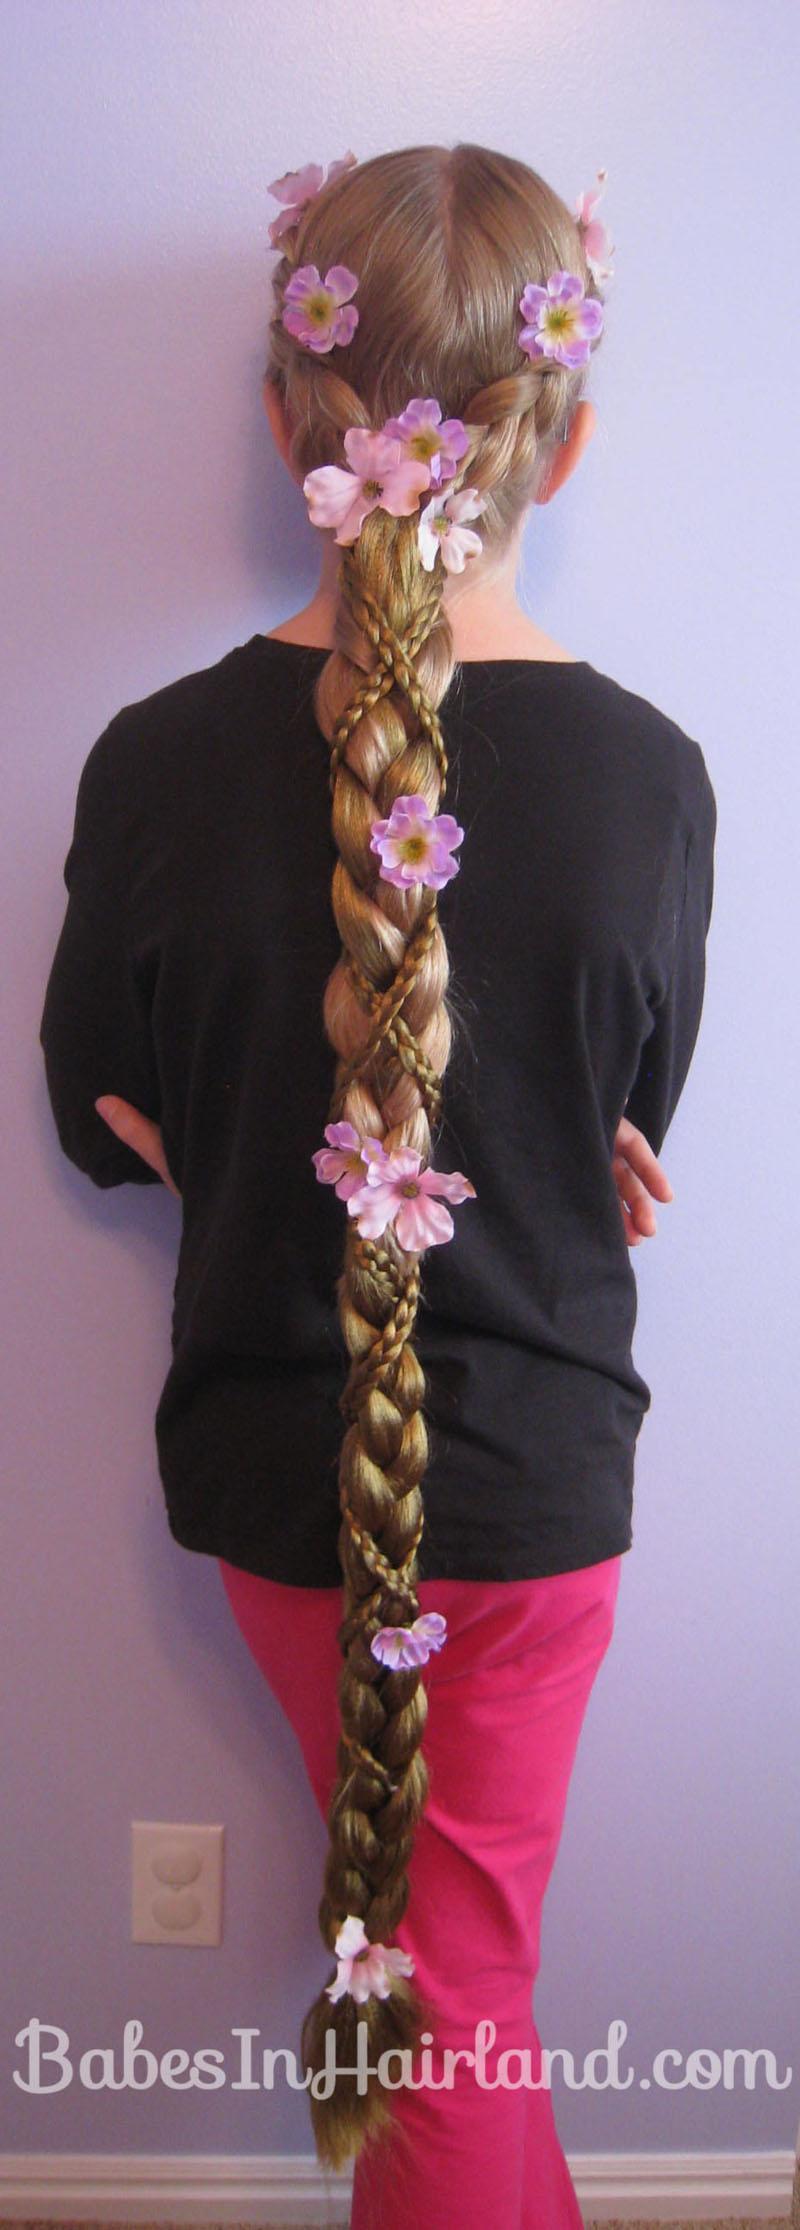 Rapunzel Hair Tutorial - Using Extensions